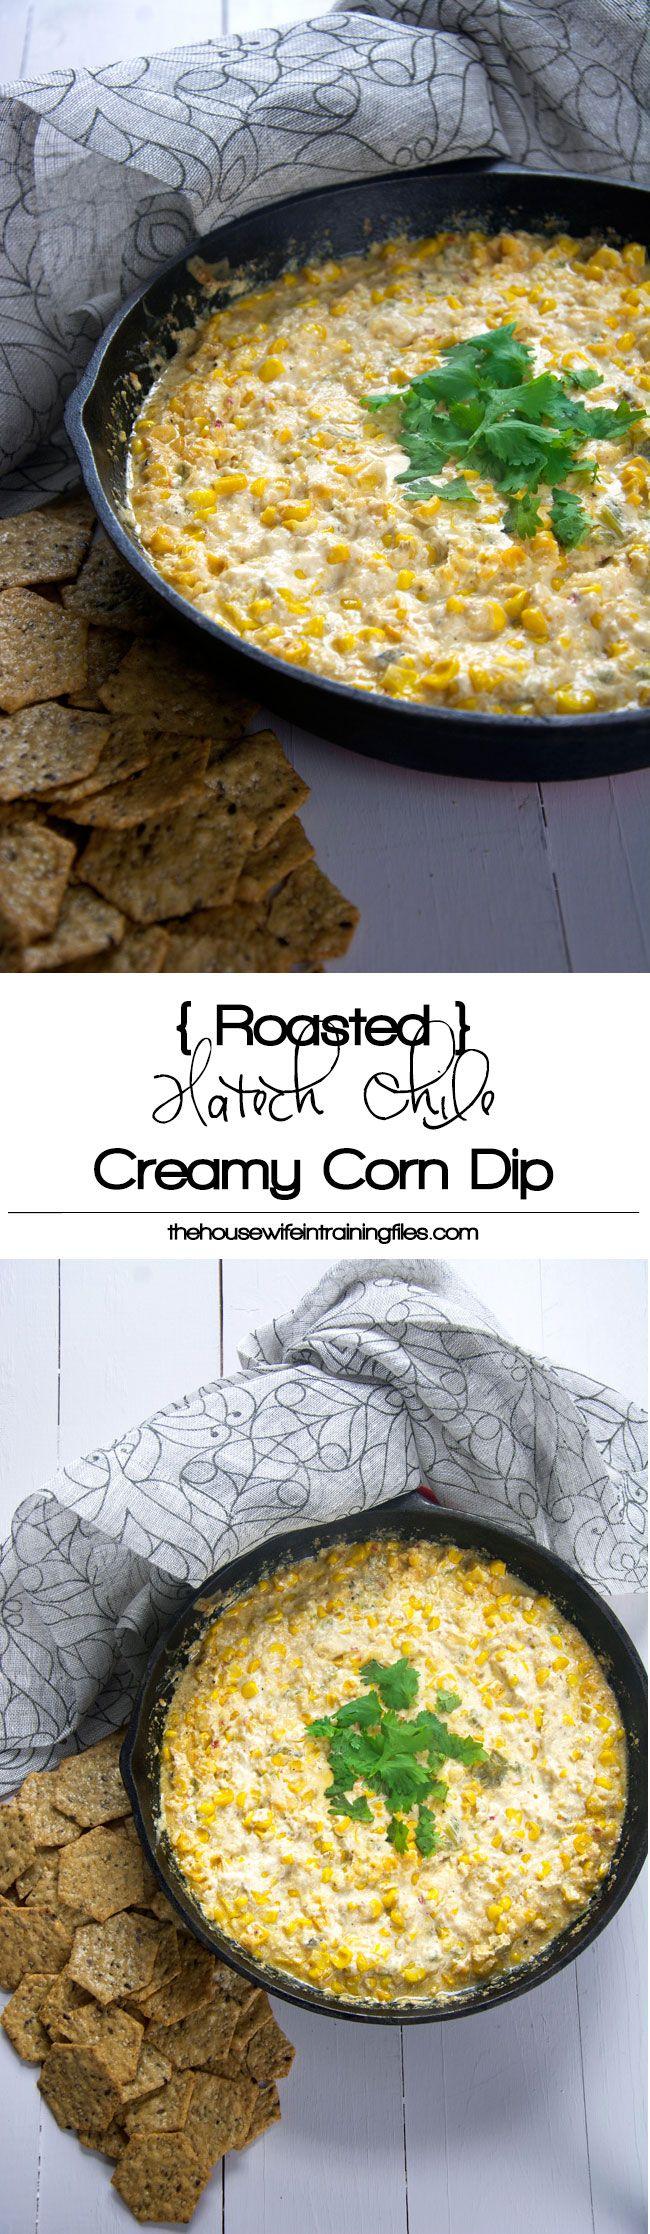 Roasted Hatch Chile Creamy Corn Dip | Recipe | Yogurt, Cream cheeses ...